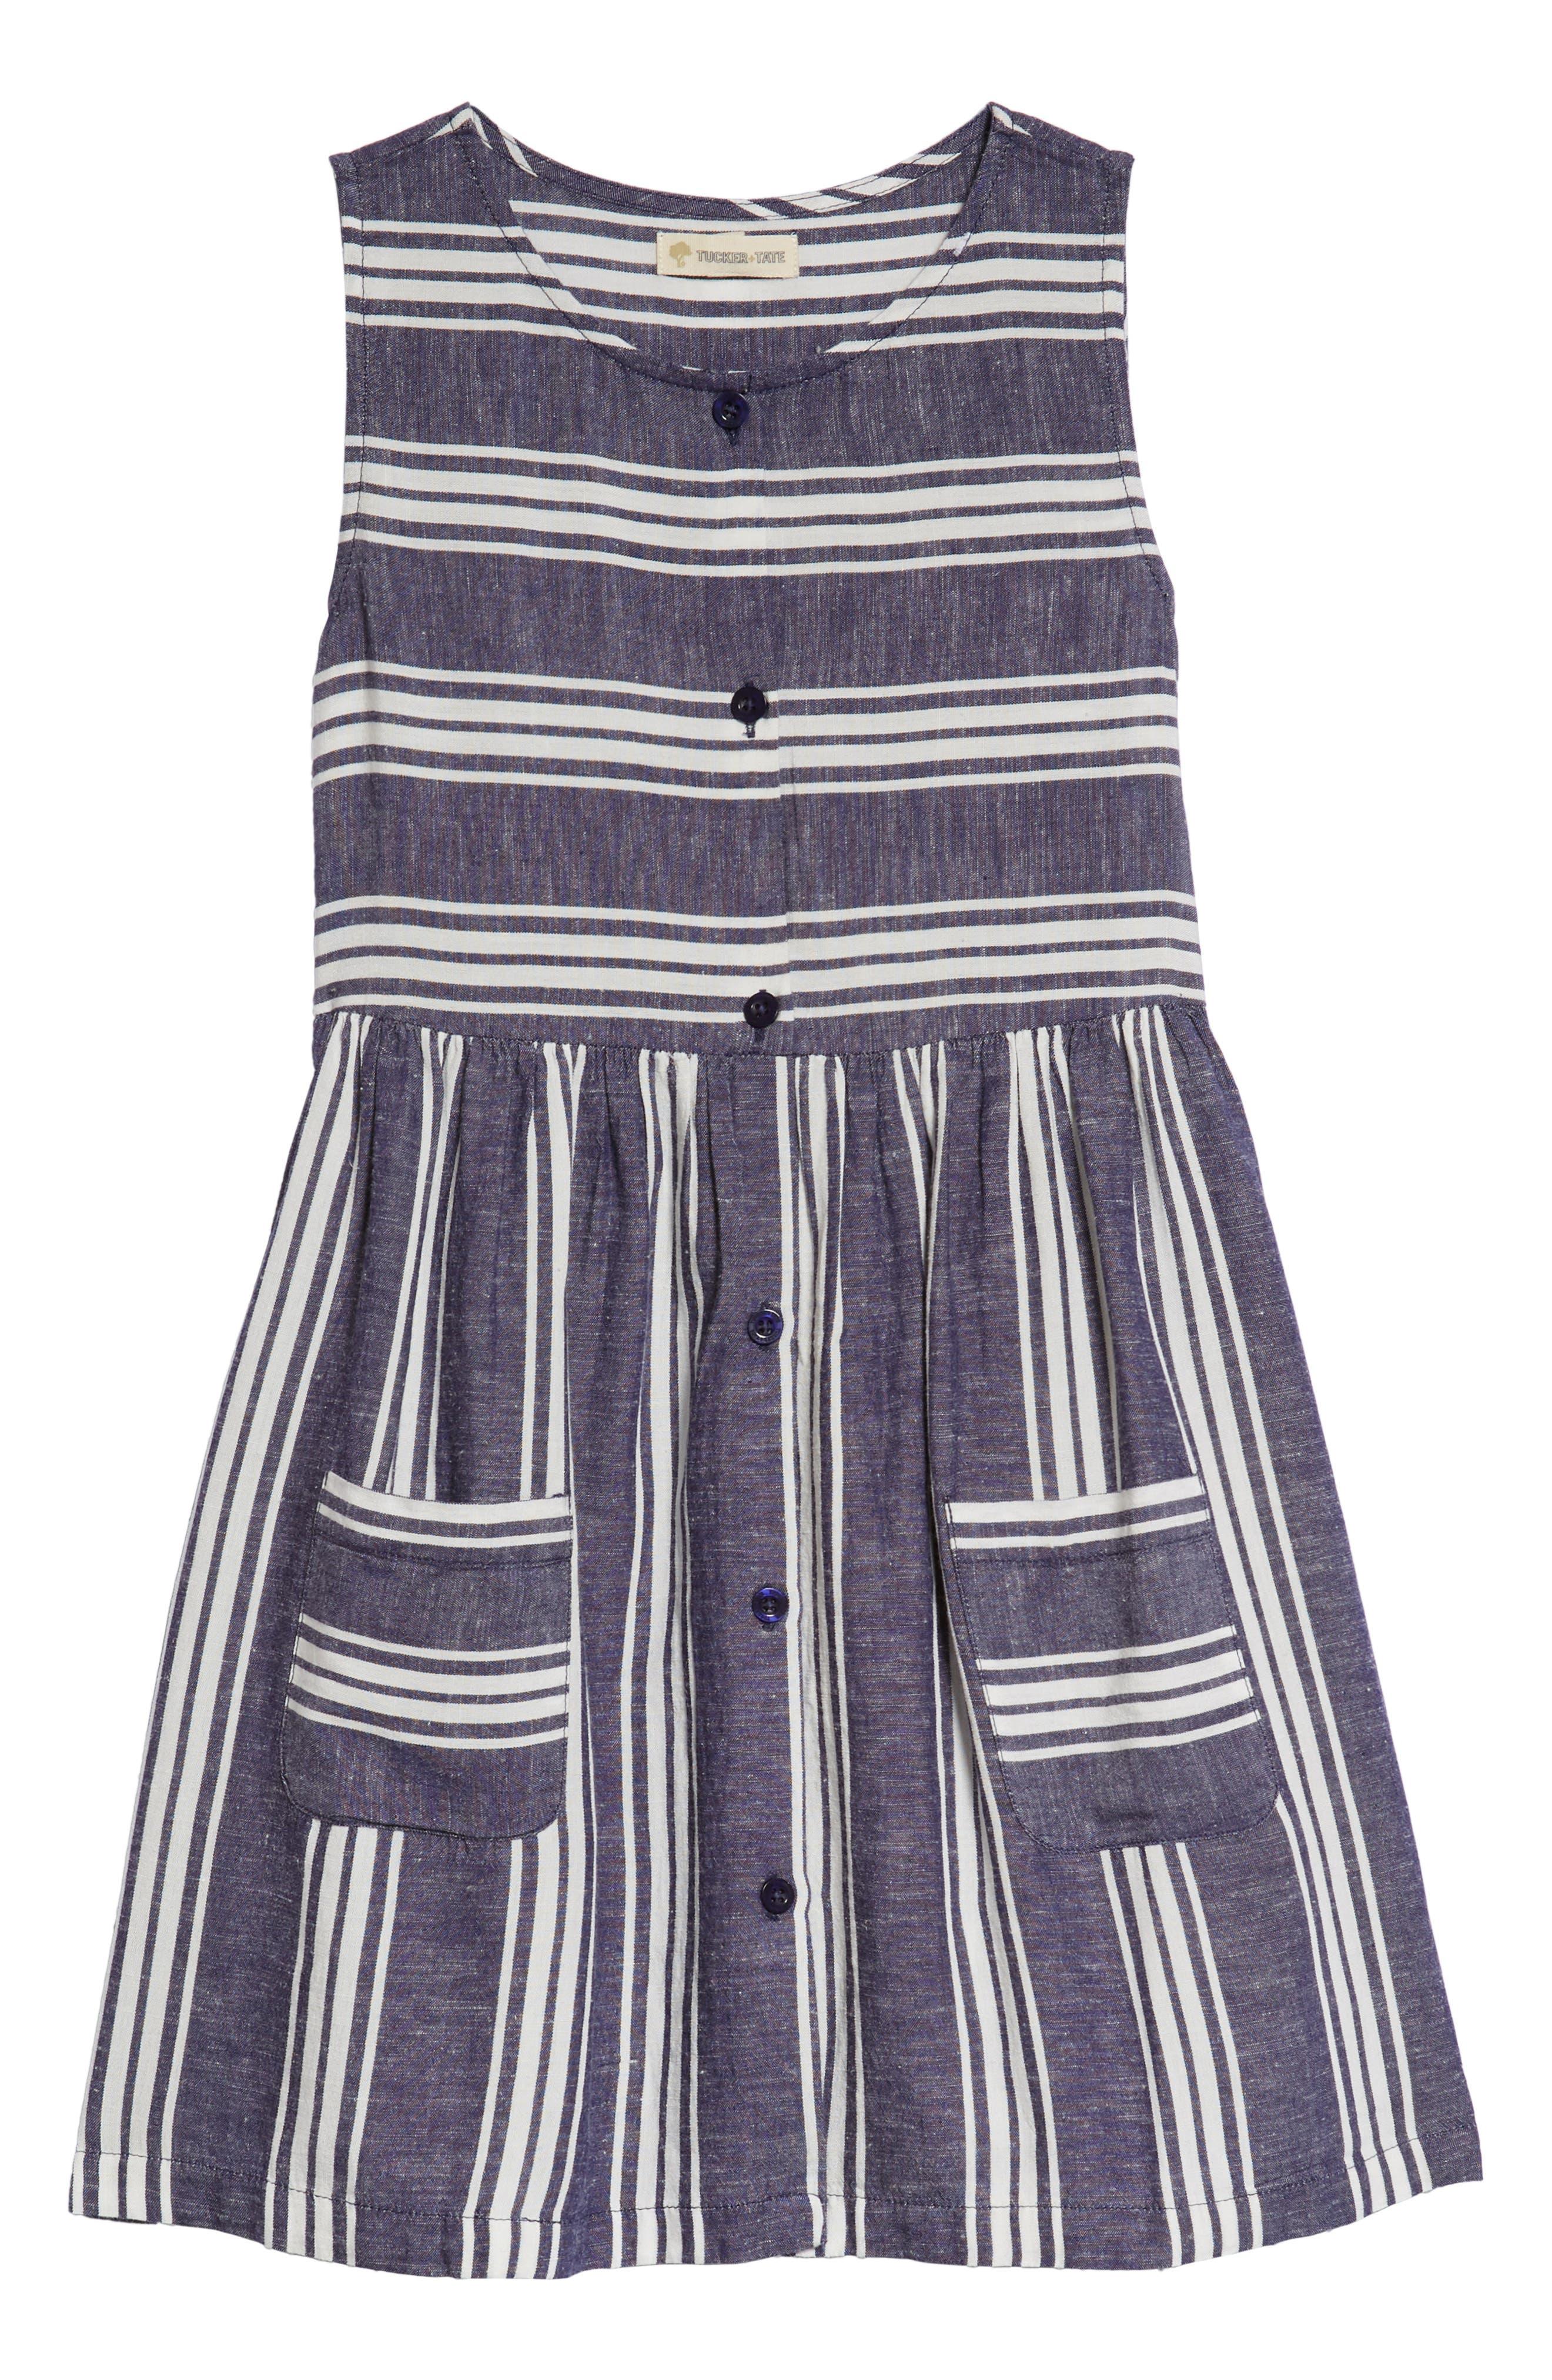 Alternate Image 1 Selected - Tucker + Tate Stripe Fit & Flare Dress (Toddler Girls, Little Girls & Big Girls)